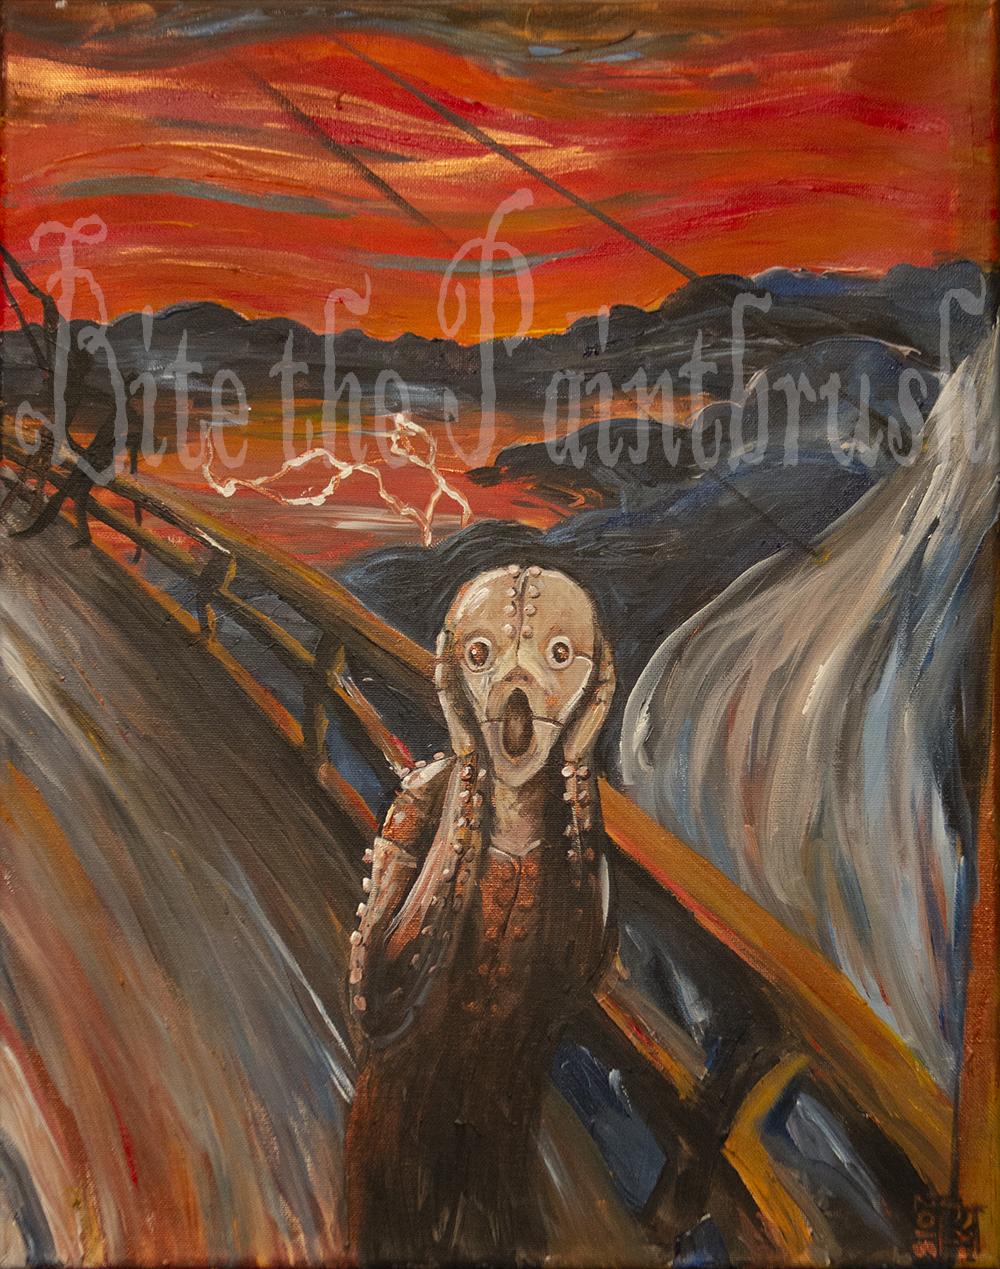 2015 Screampunk.jpg